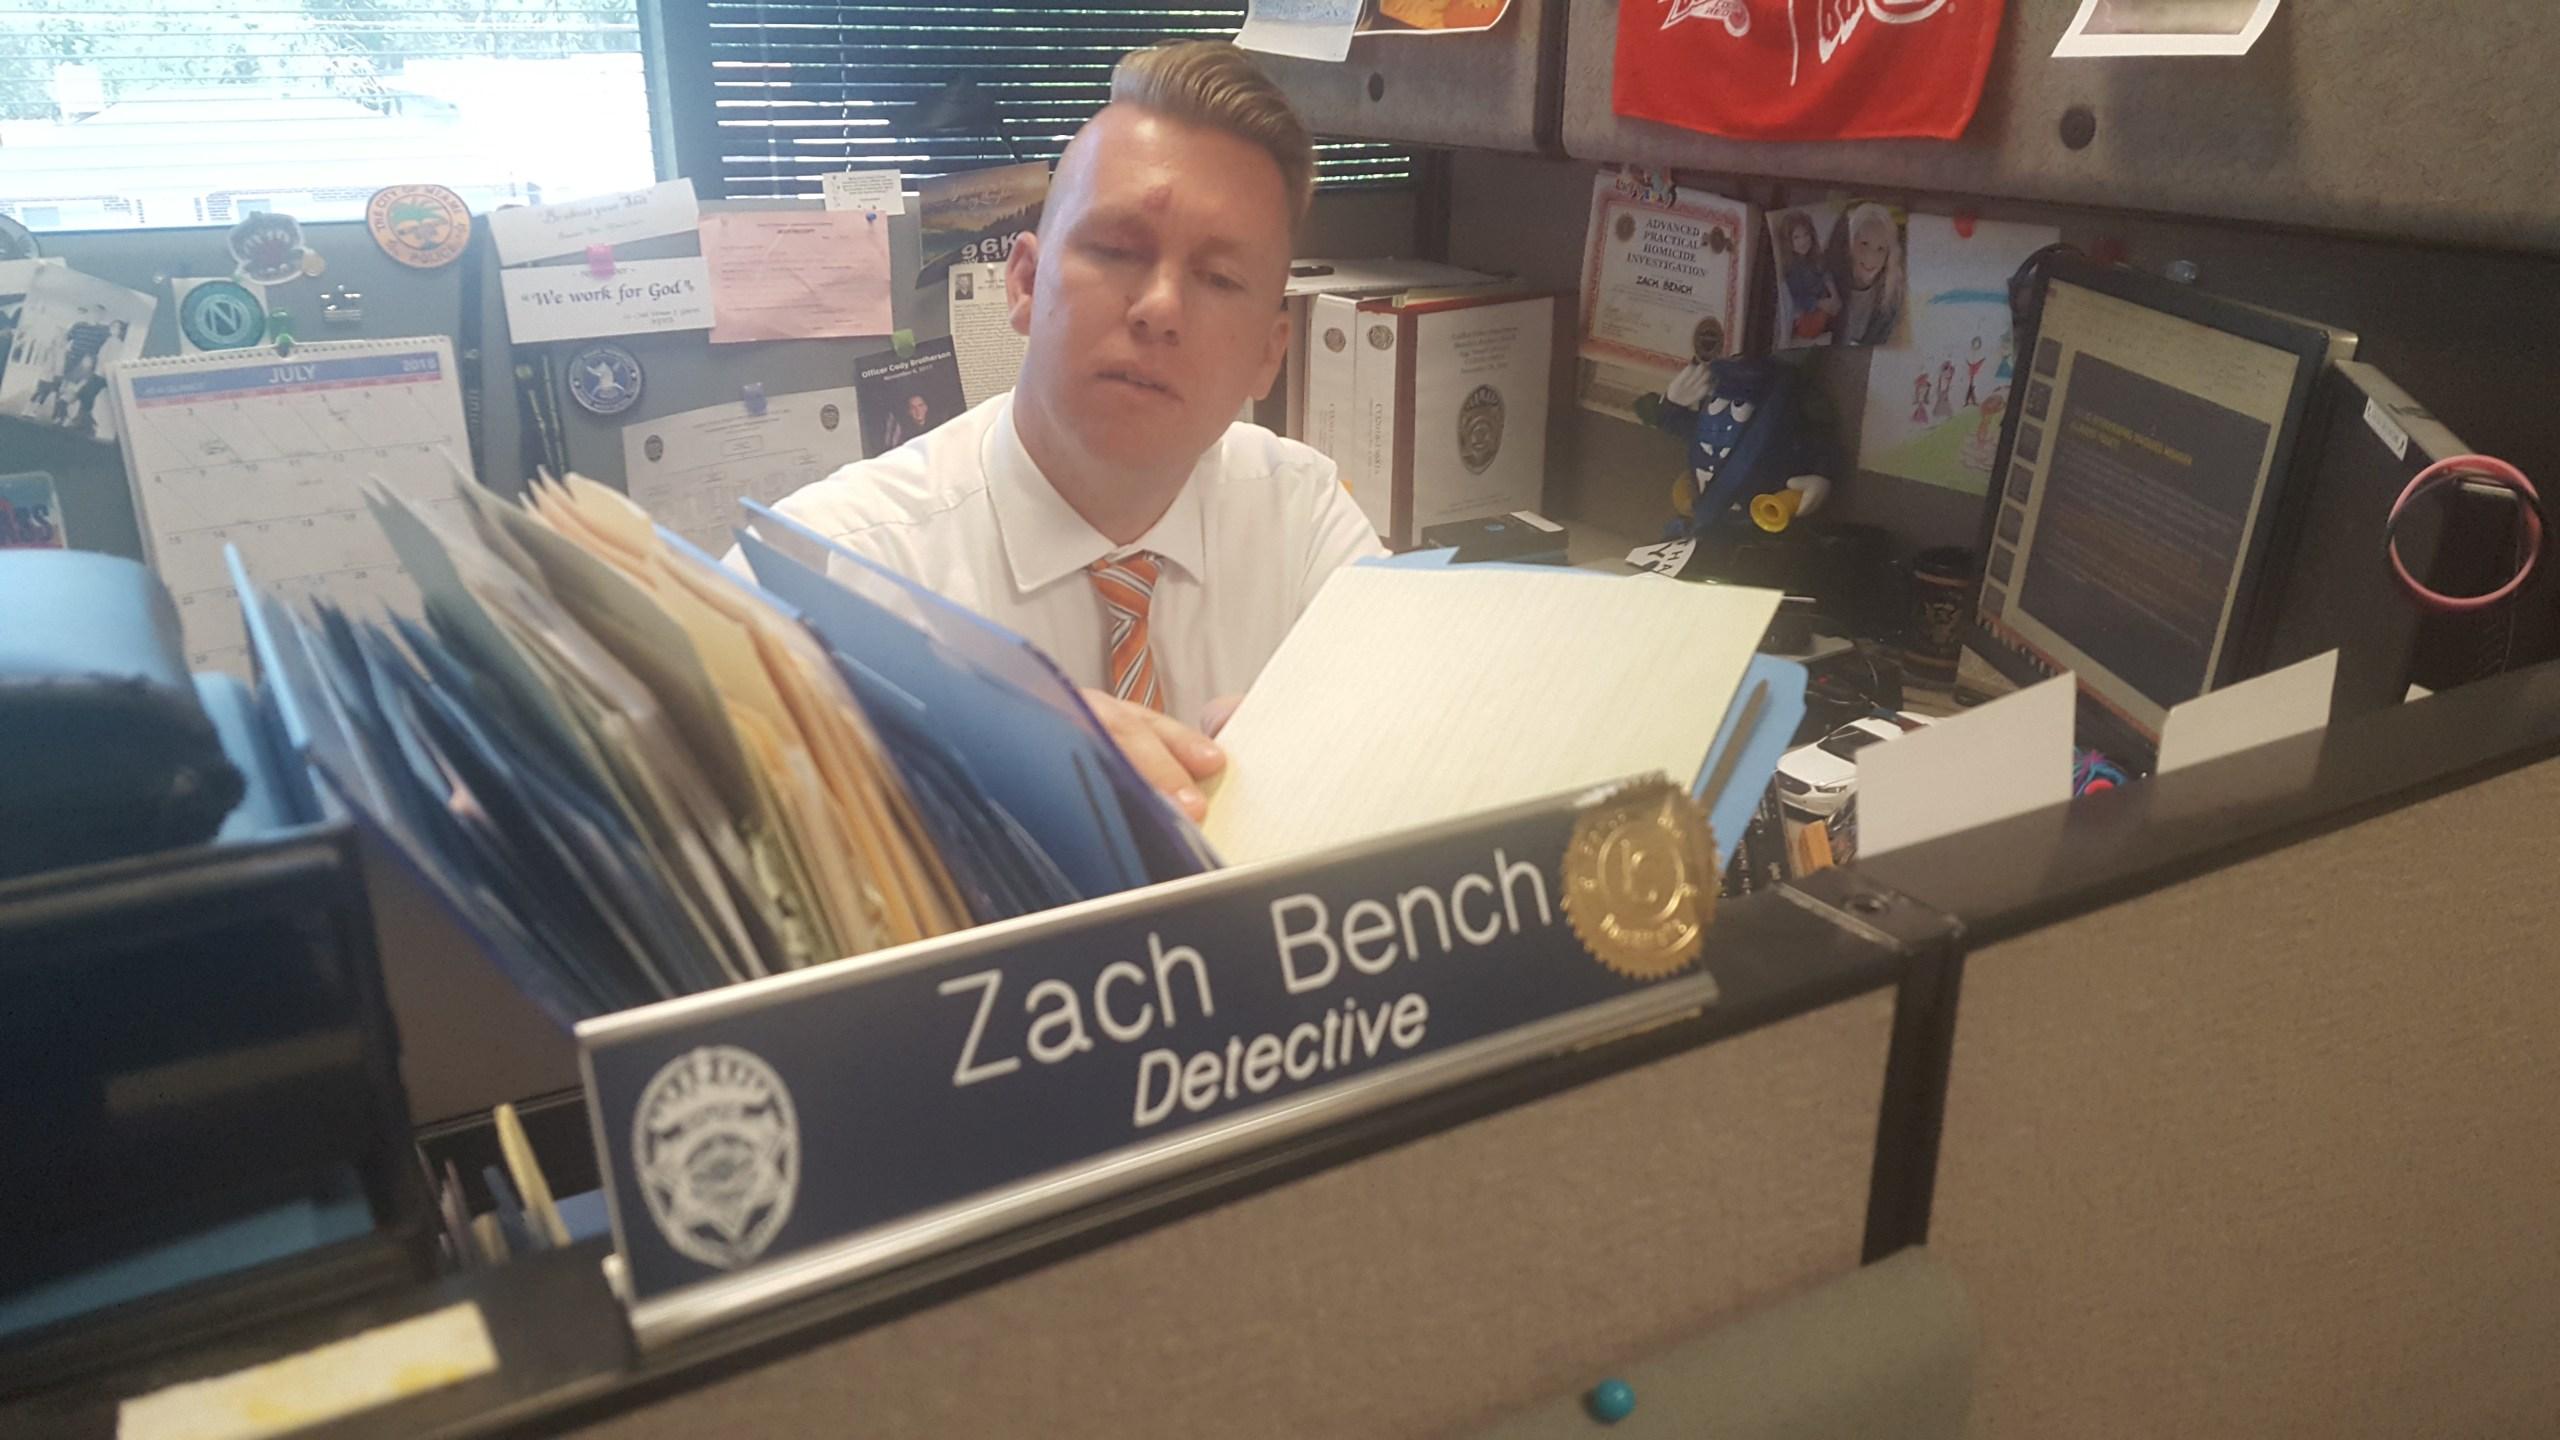 Detective Zach Bench 1_1531444124463.jpg.jpg